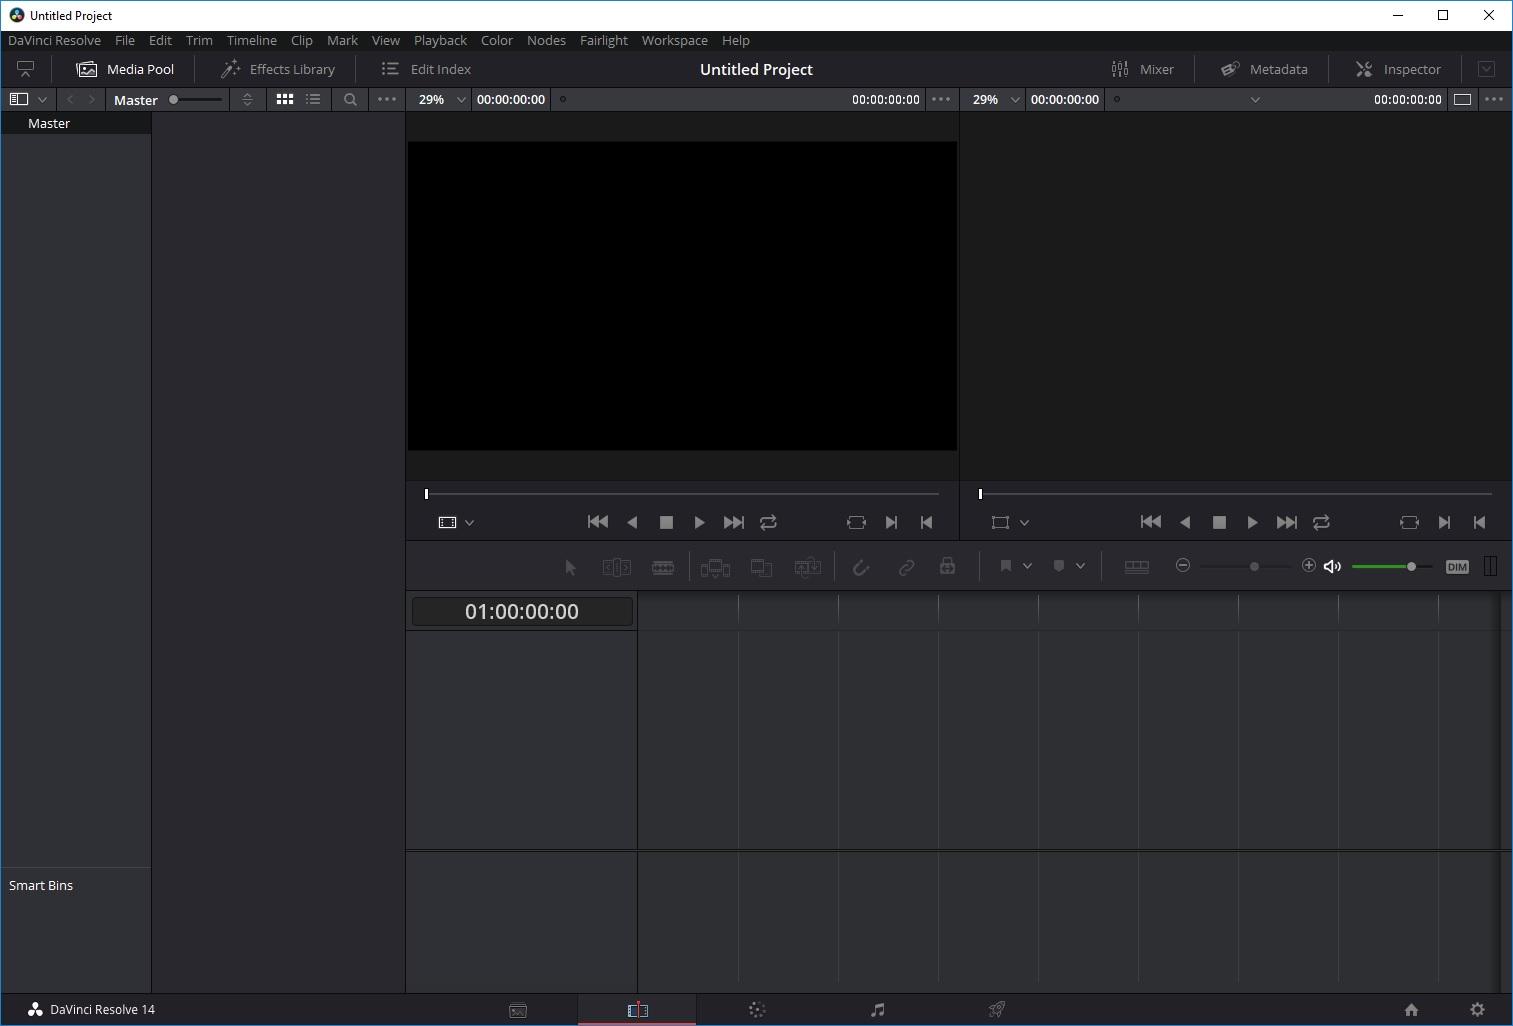 Blackmagic Design DaVinci Resolve Studio v16.1.0.55 x64 - ENG